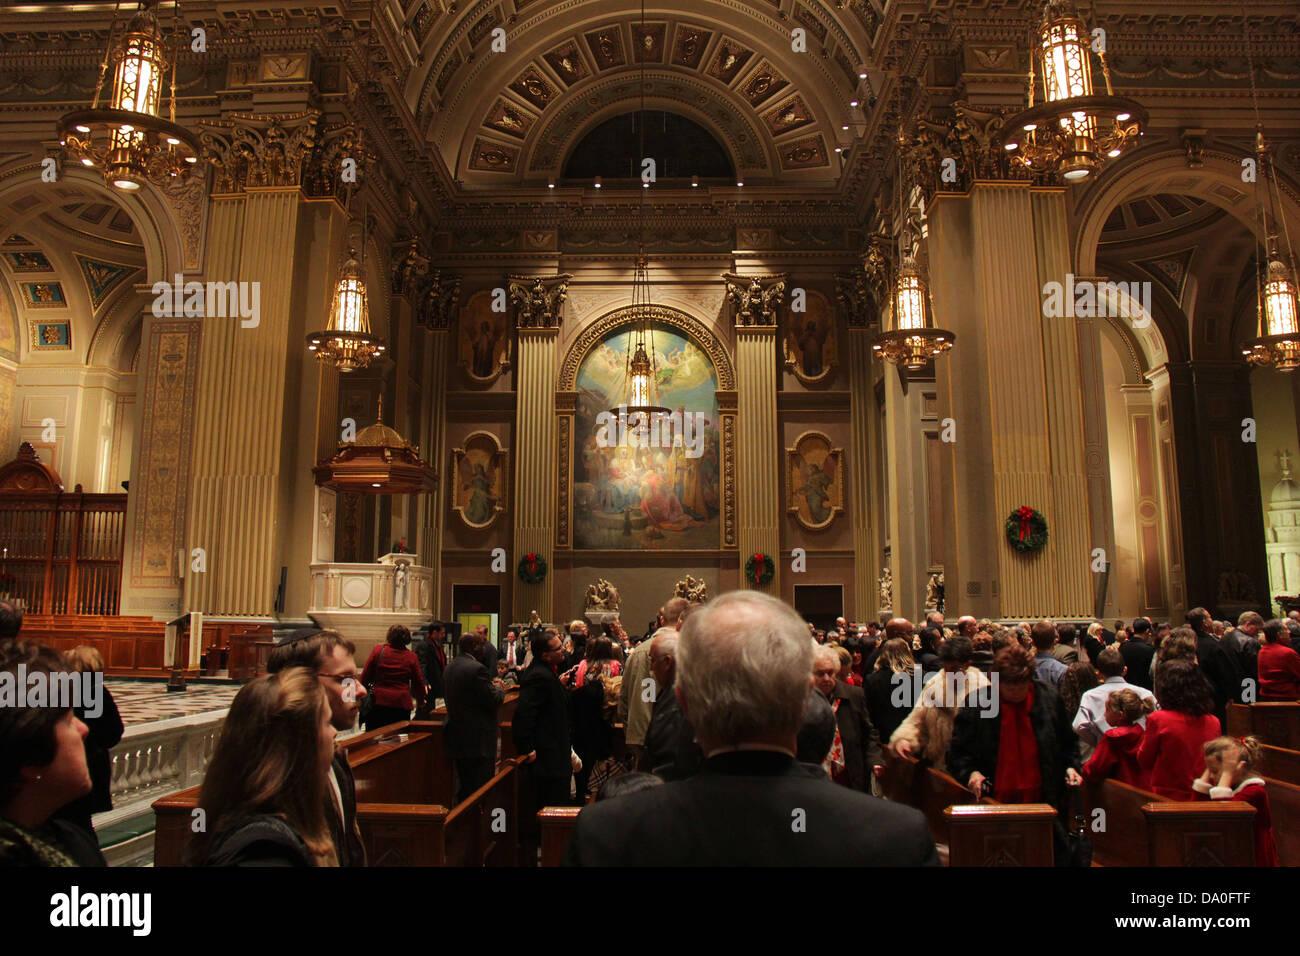 Kathedrale Basilica der Heiligen Petrus und Paulus, Race Street, Philadelphia, Pennsylvania. Stockbild